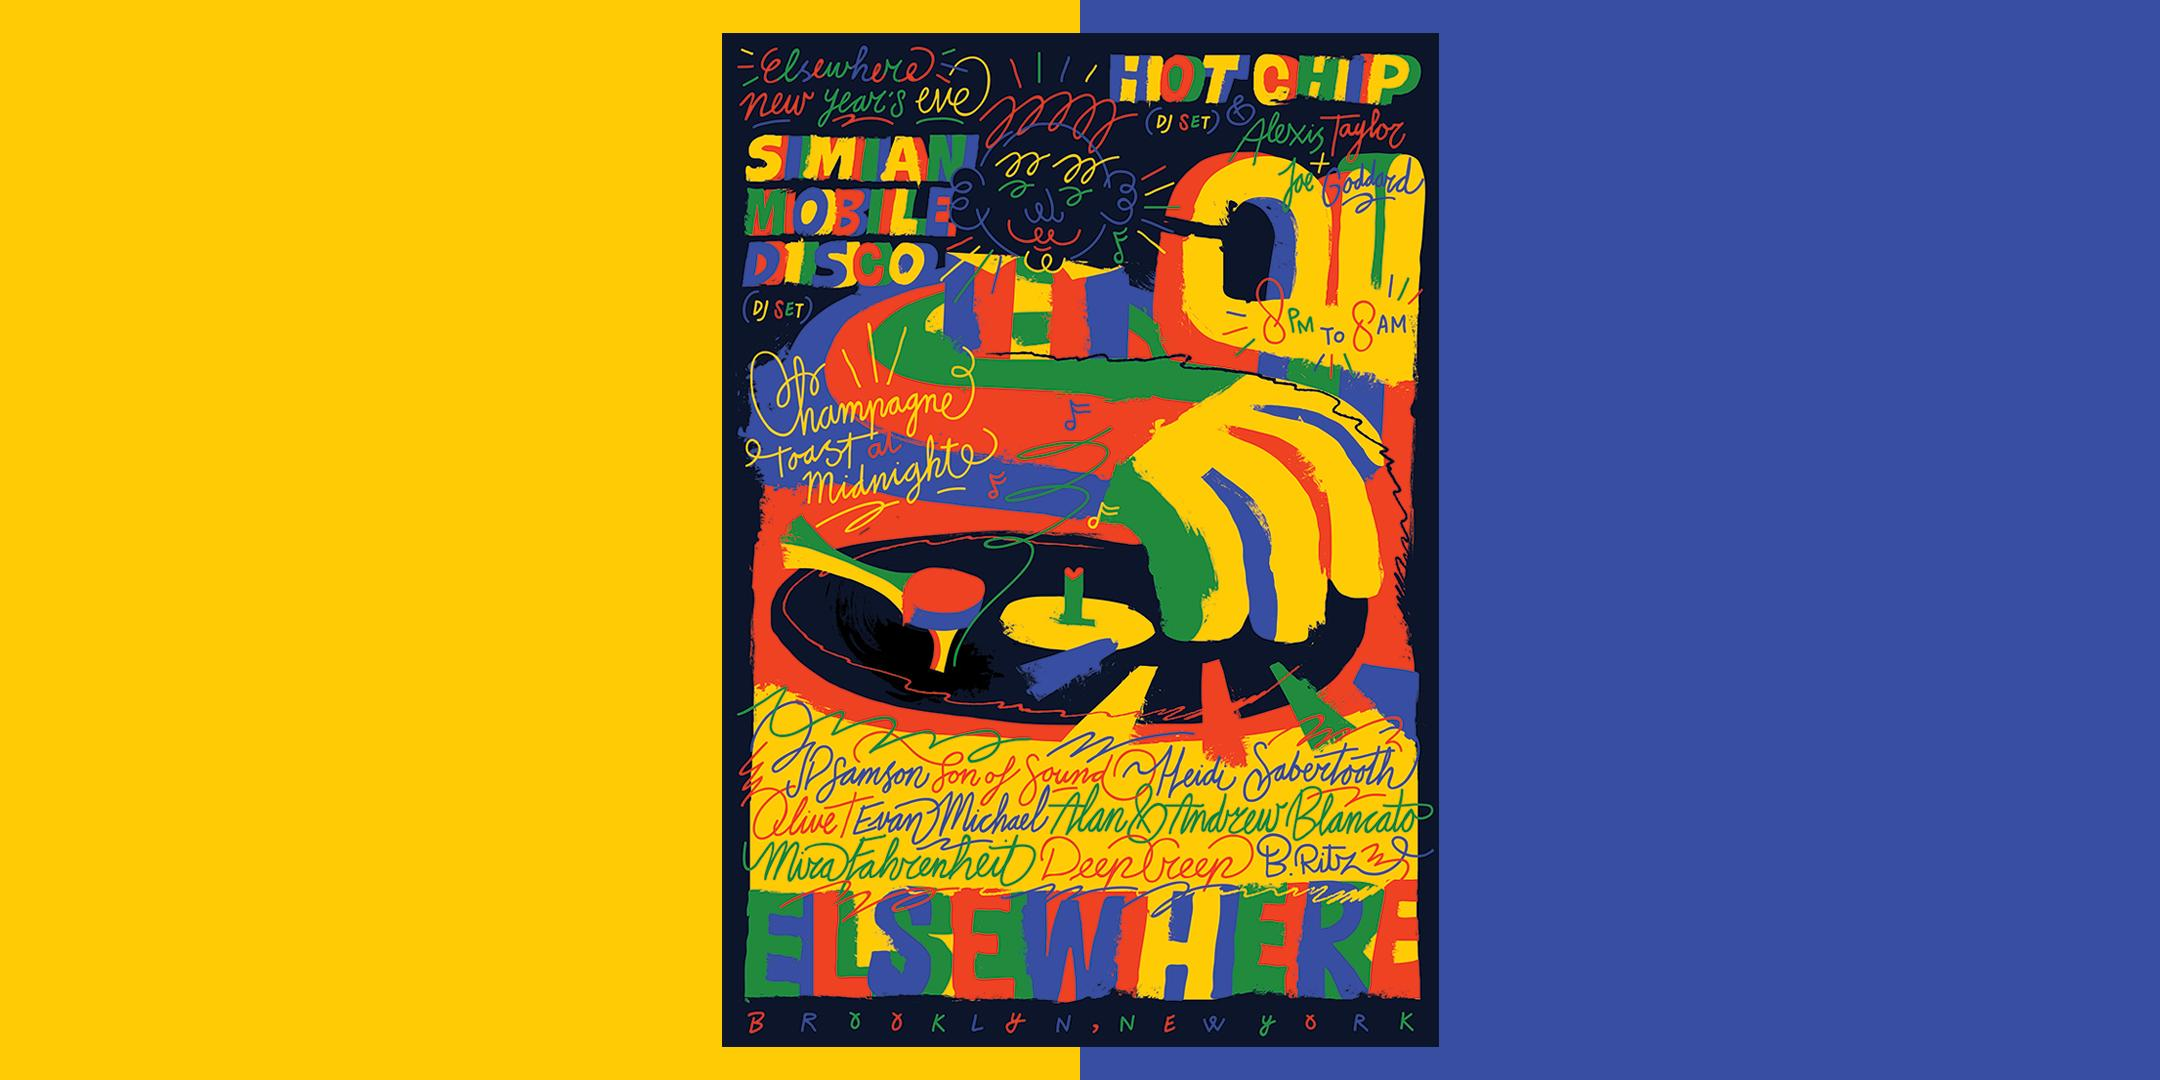 Hot Chip (DJ Set) + Simian Mobile Disco (DJ Set)